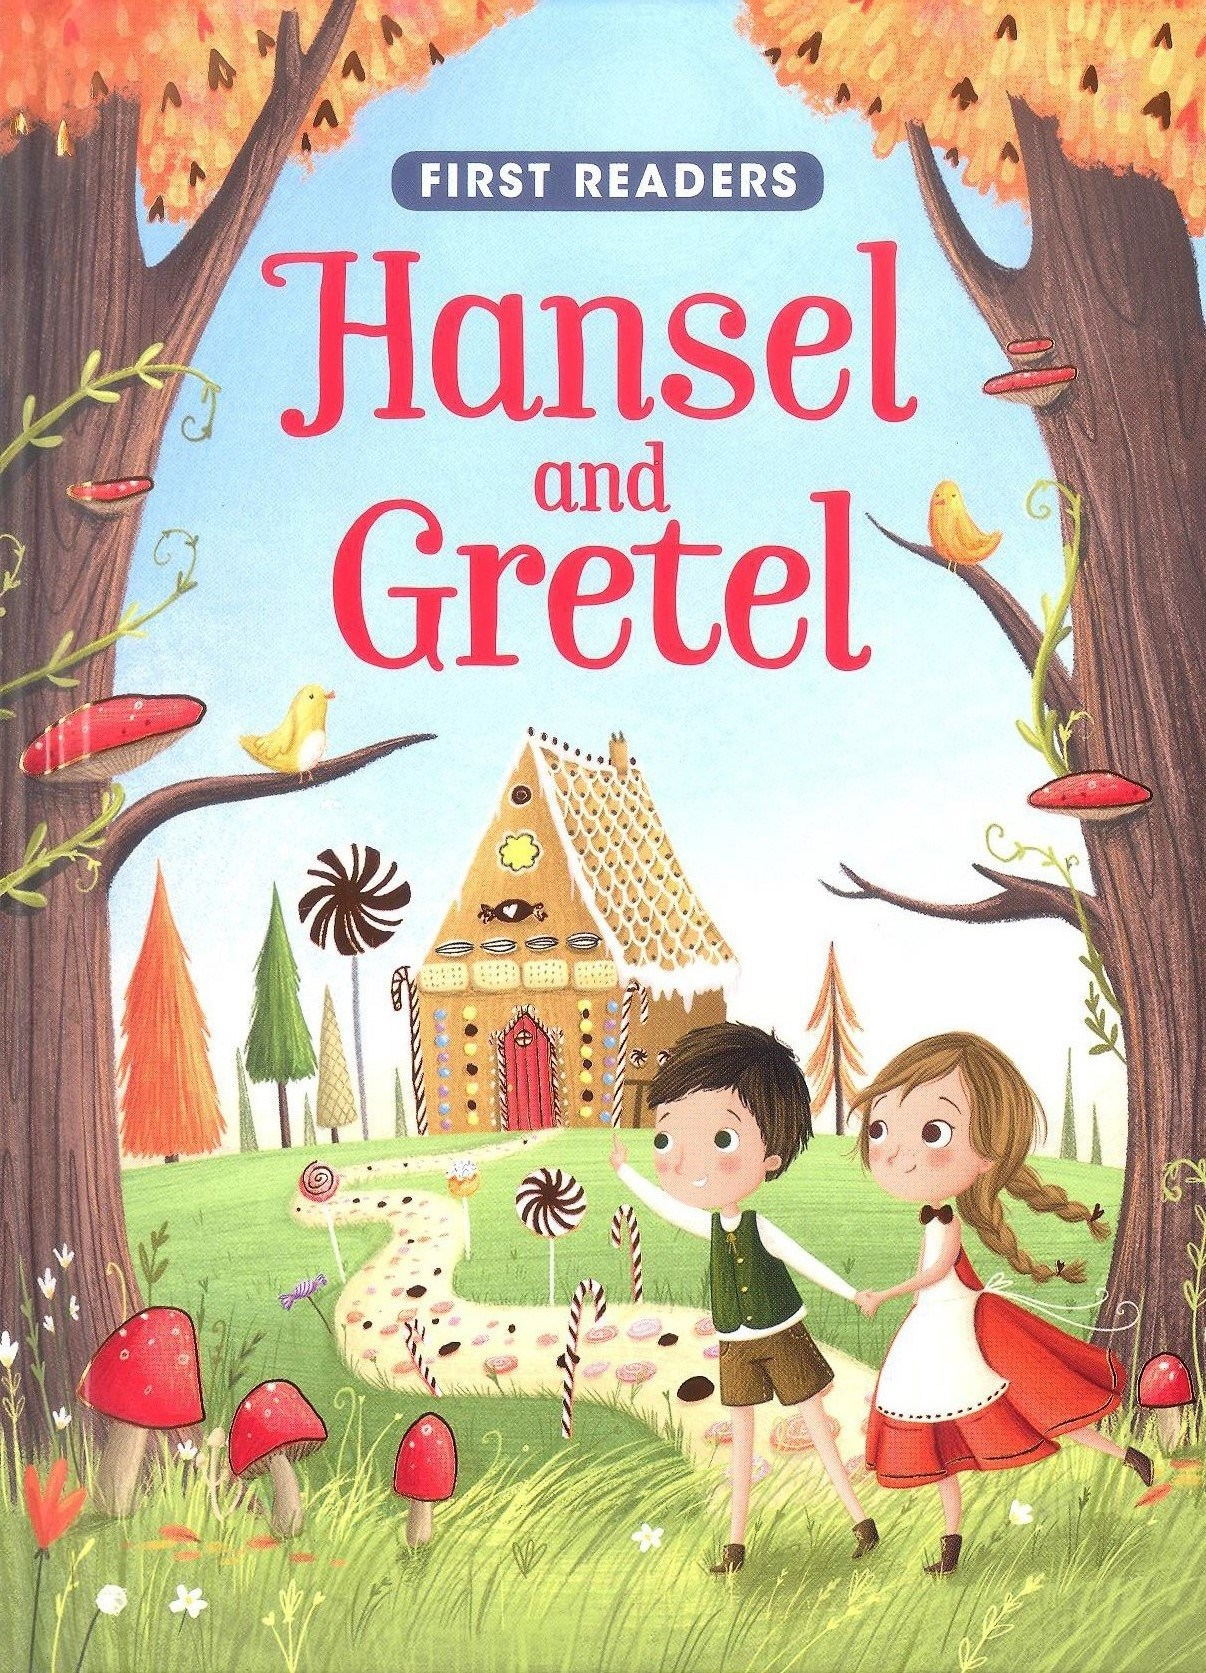 Hansel & Gretel (Brothers Grimm)